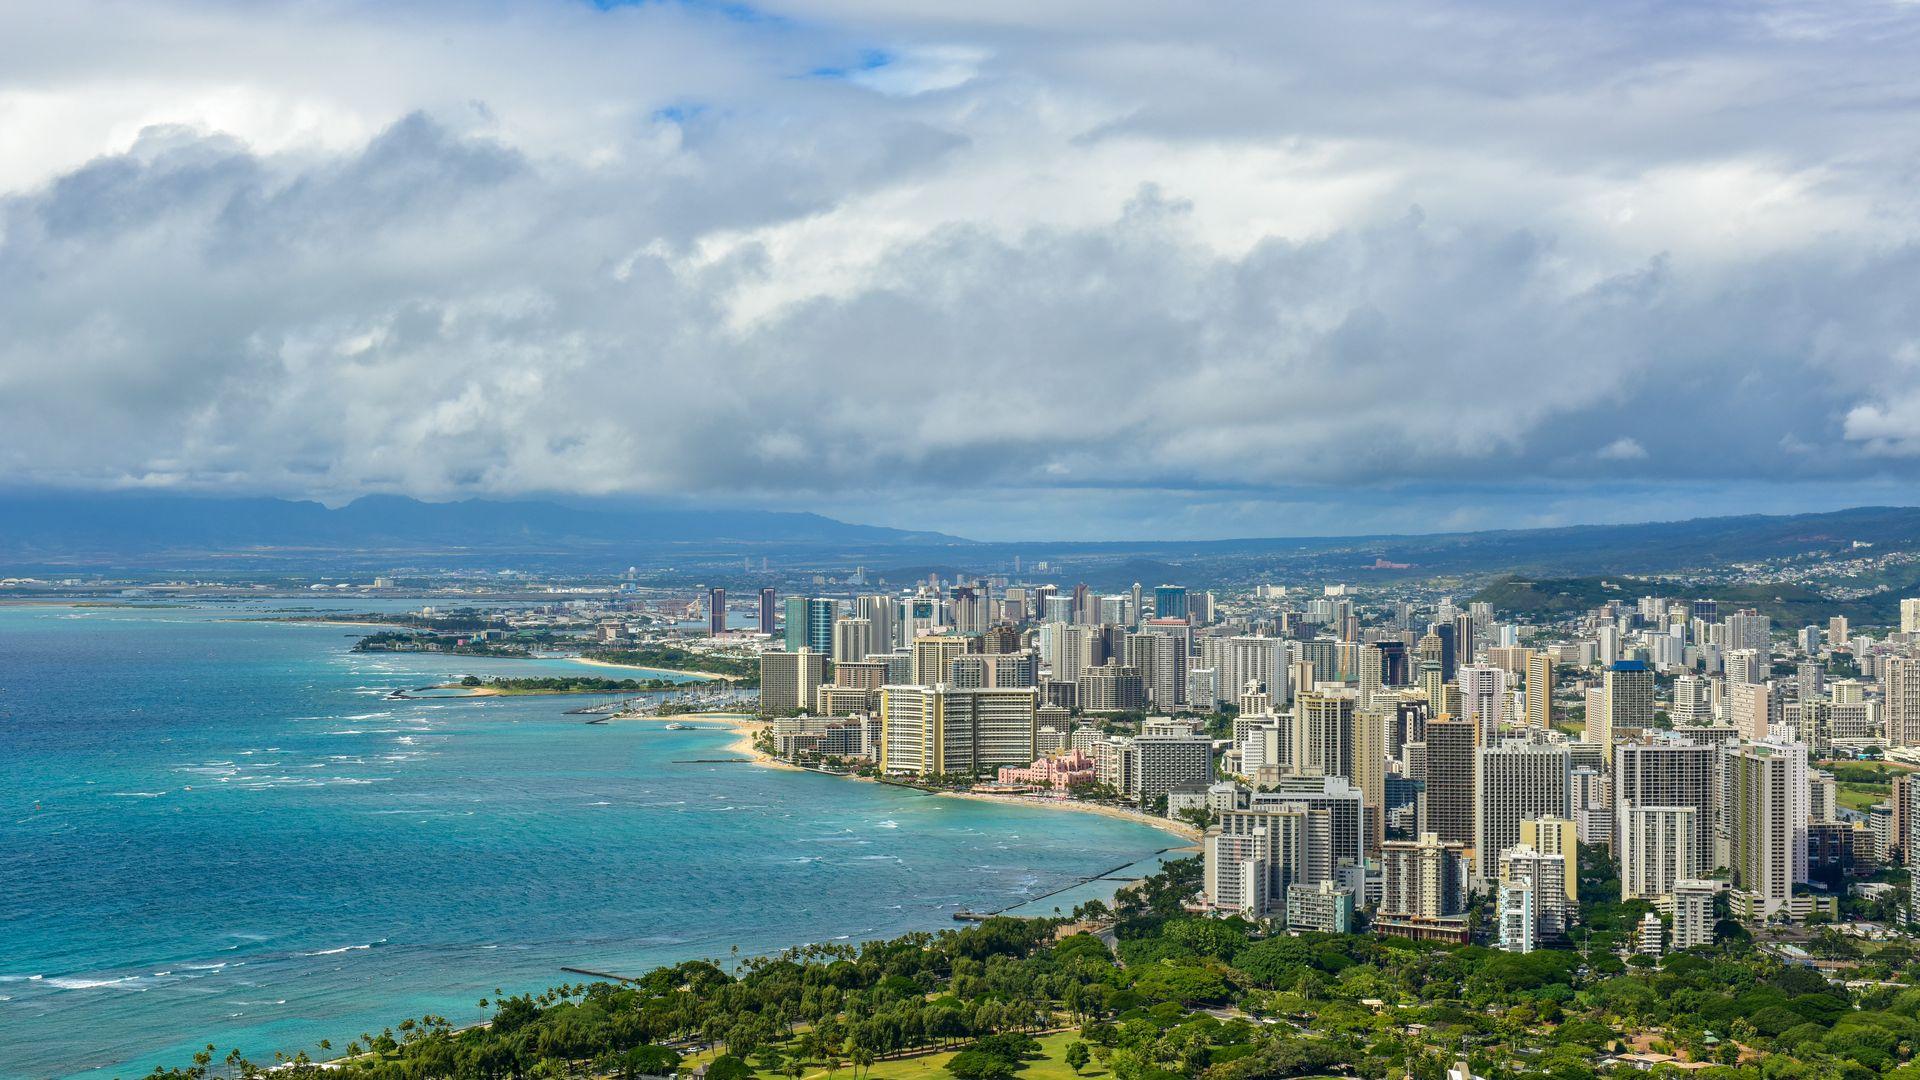 Qué ver en Honolulu